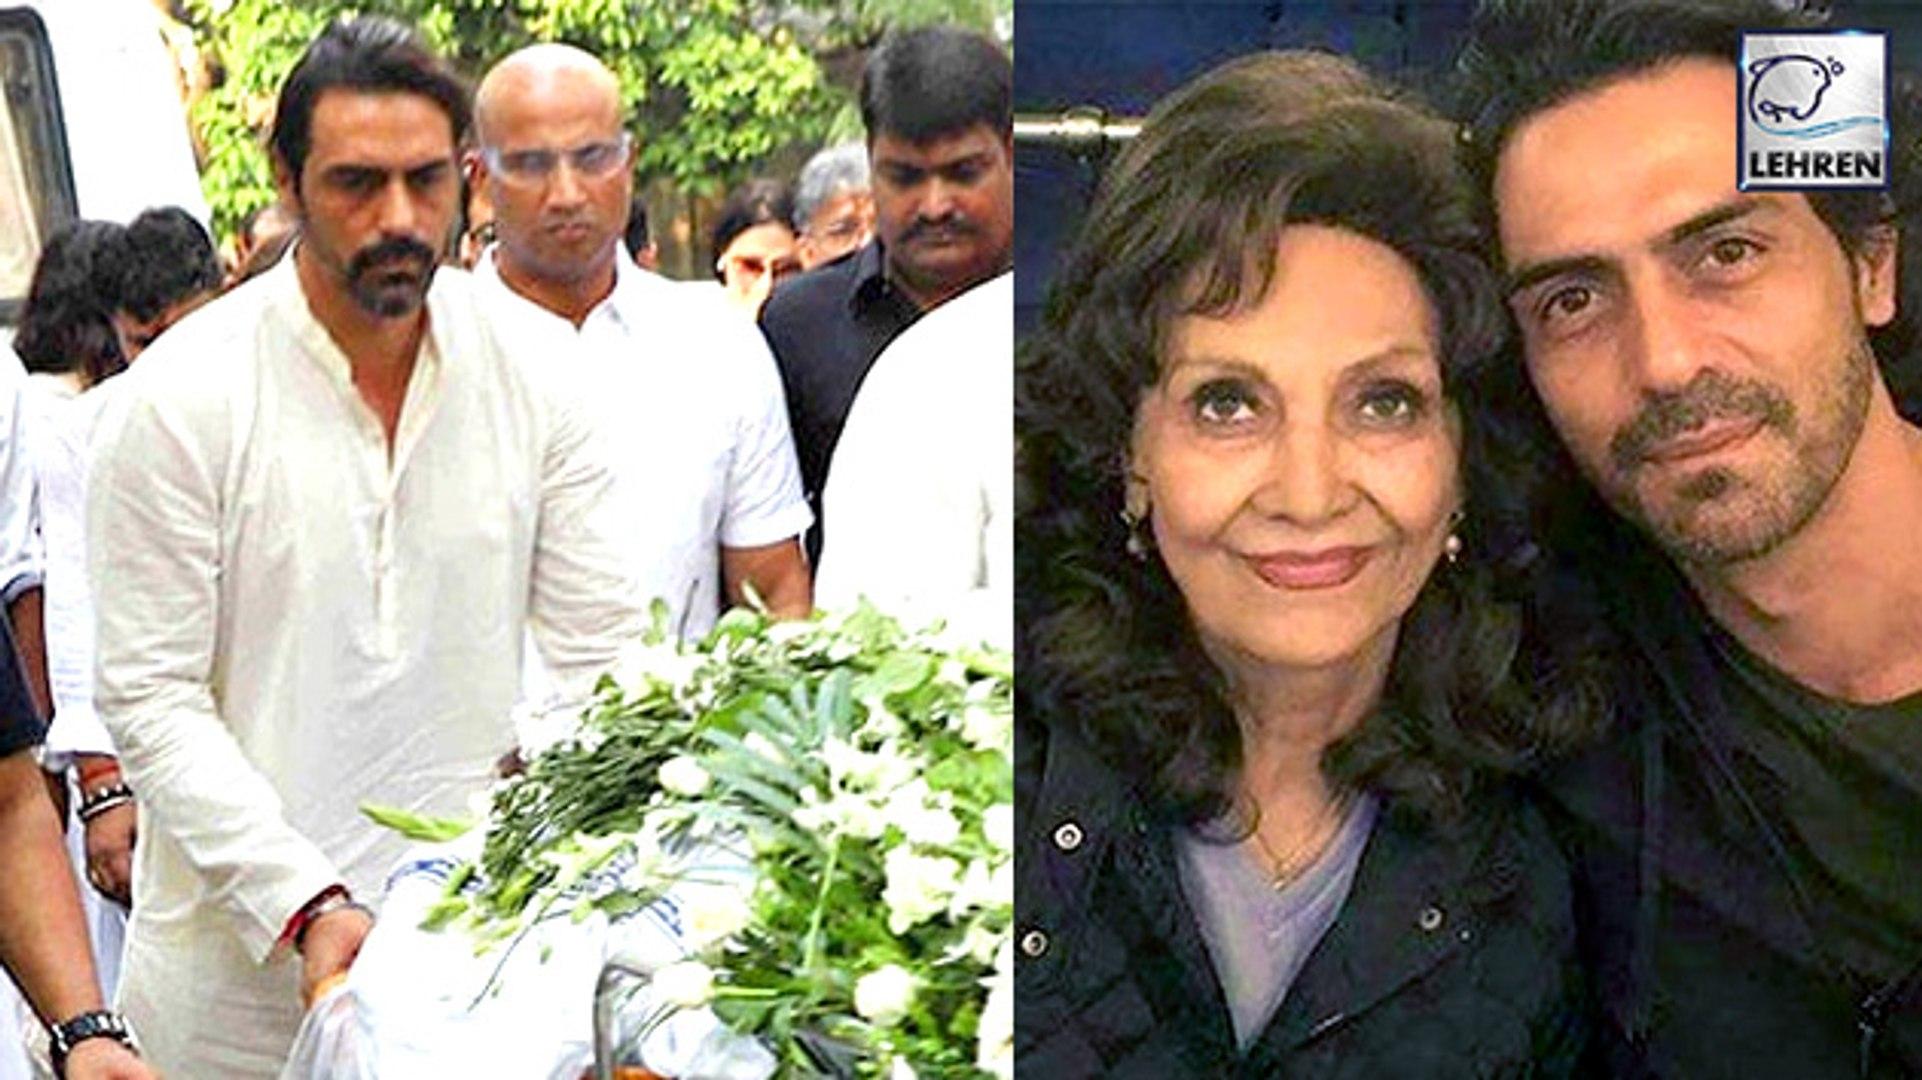 Arjun Rampal's Mother Gwen Rampal Passes Away: Mehr, Gabriella Attend Last Rites